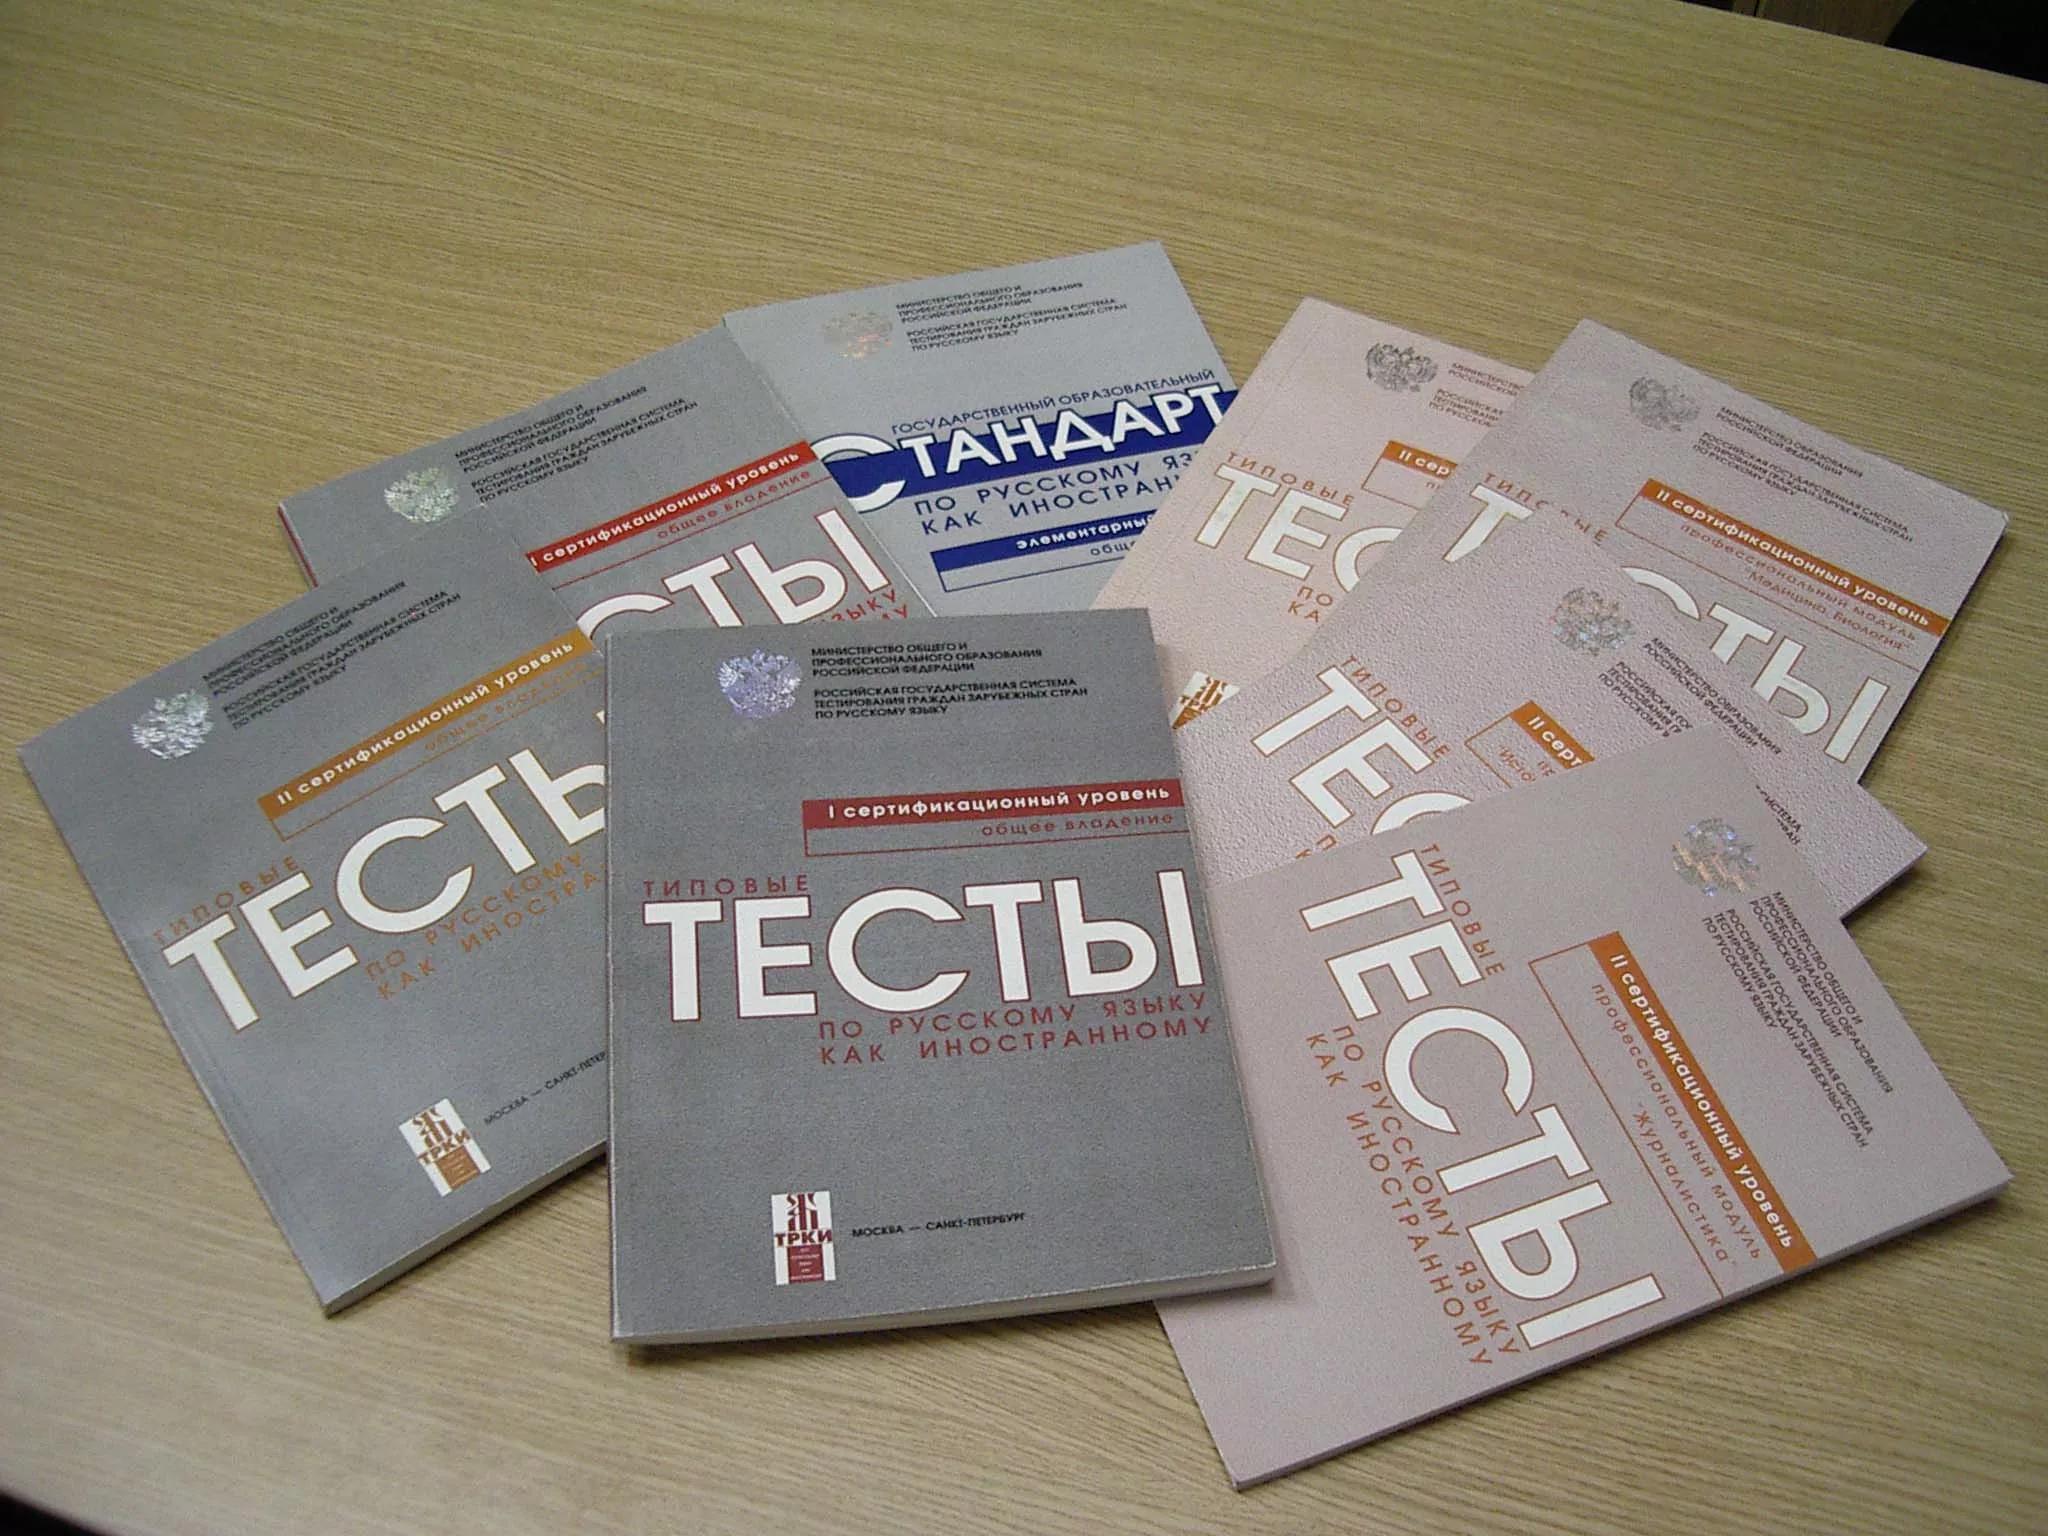 https://www.slav.uni-sofia.bg/images/stories/testove.jpg